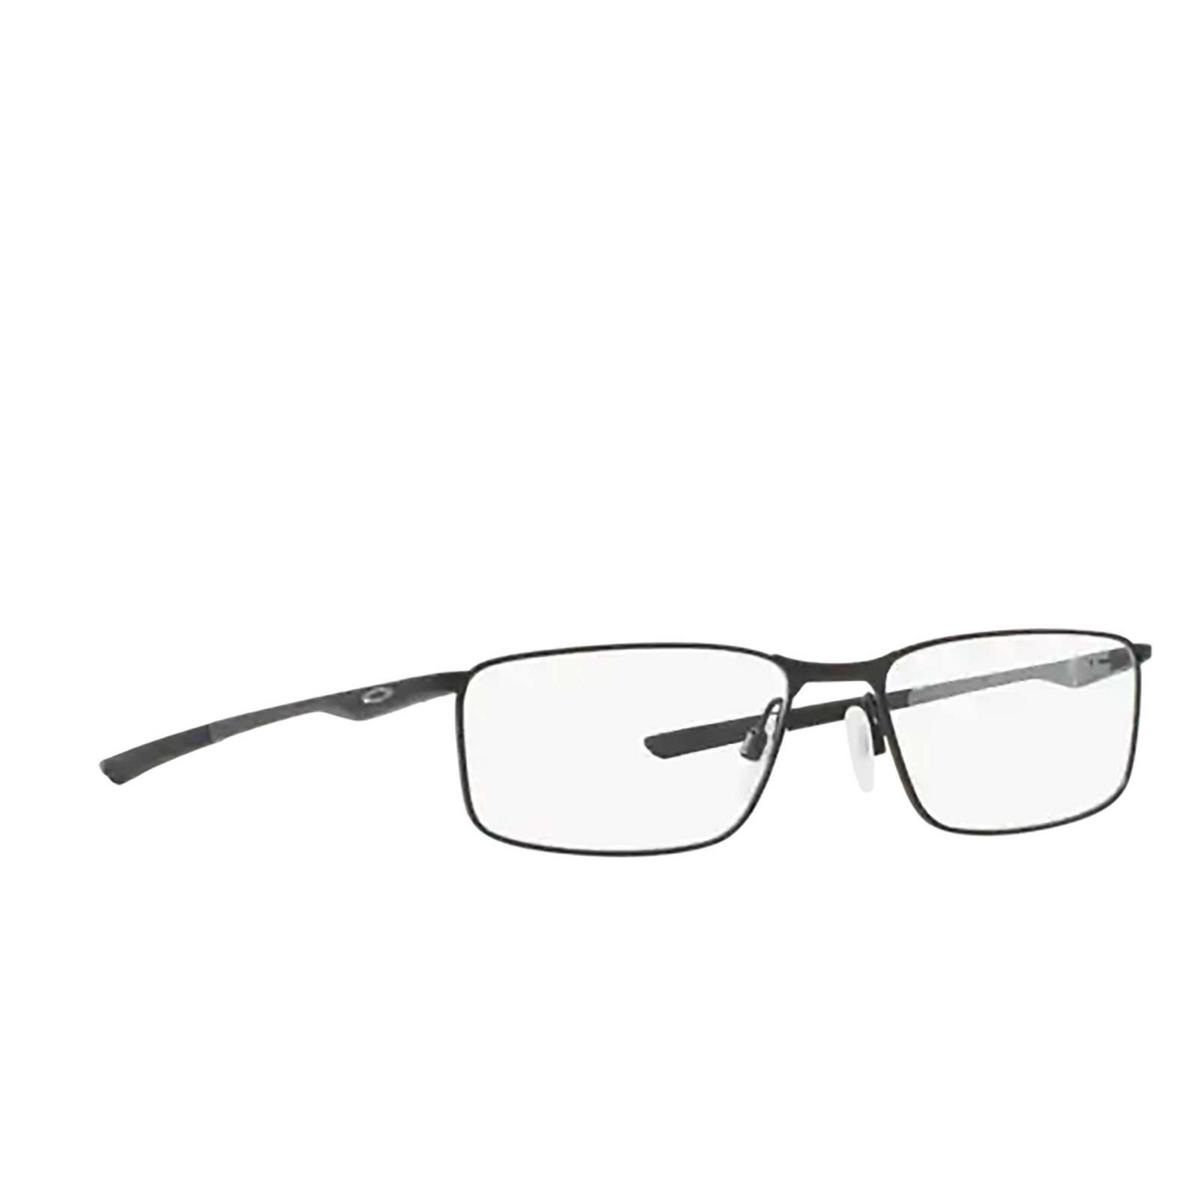 Oakley® Rectangle Eyeglasses: Socket 5.0 OX3217 color Satin Black 321701 - three-quarters view.